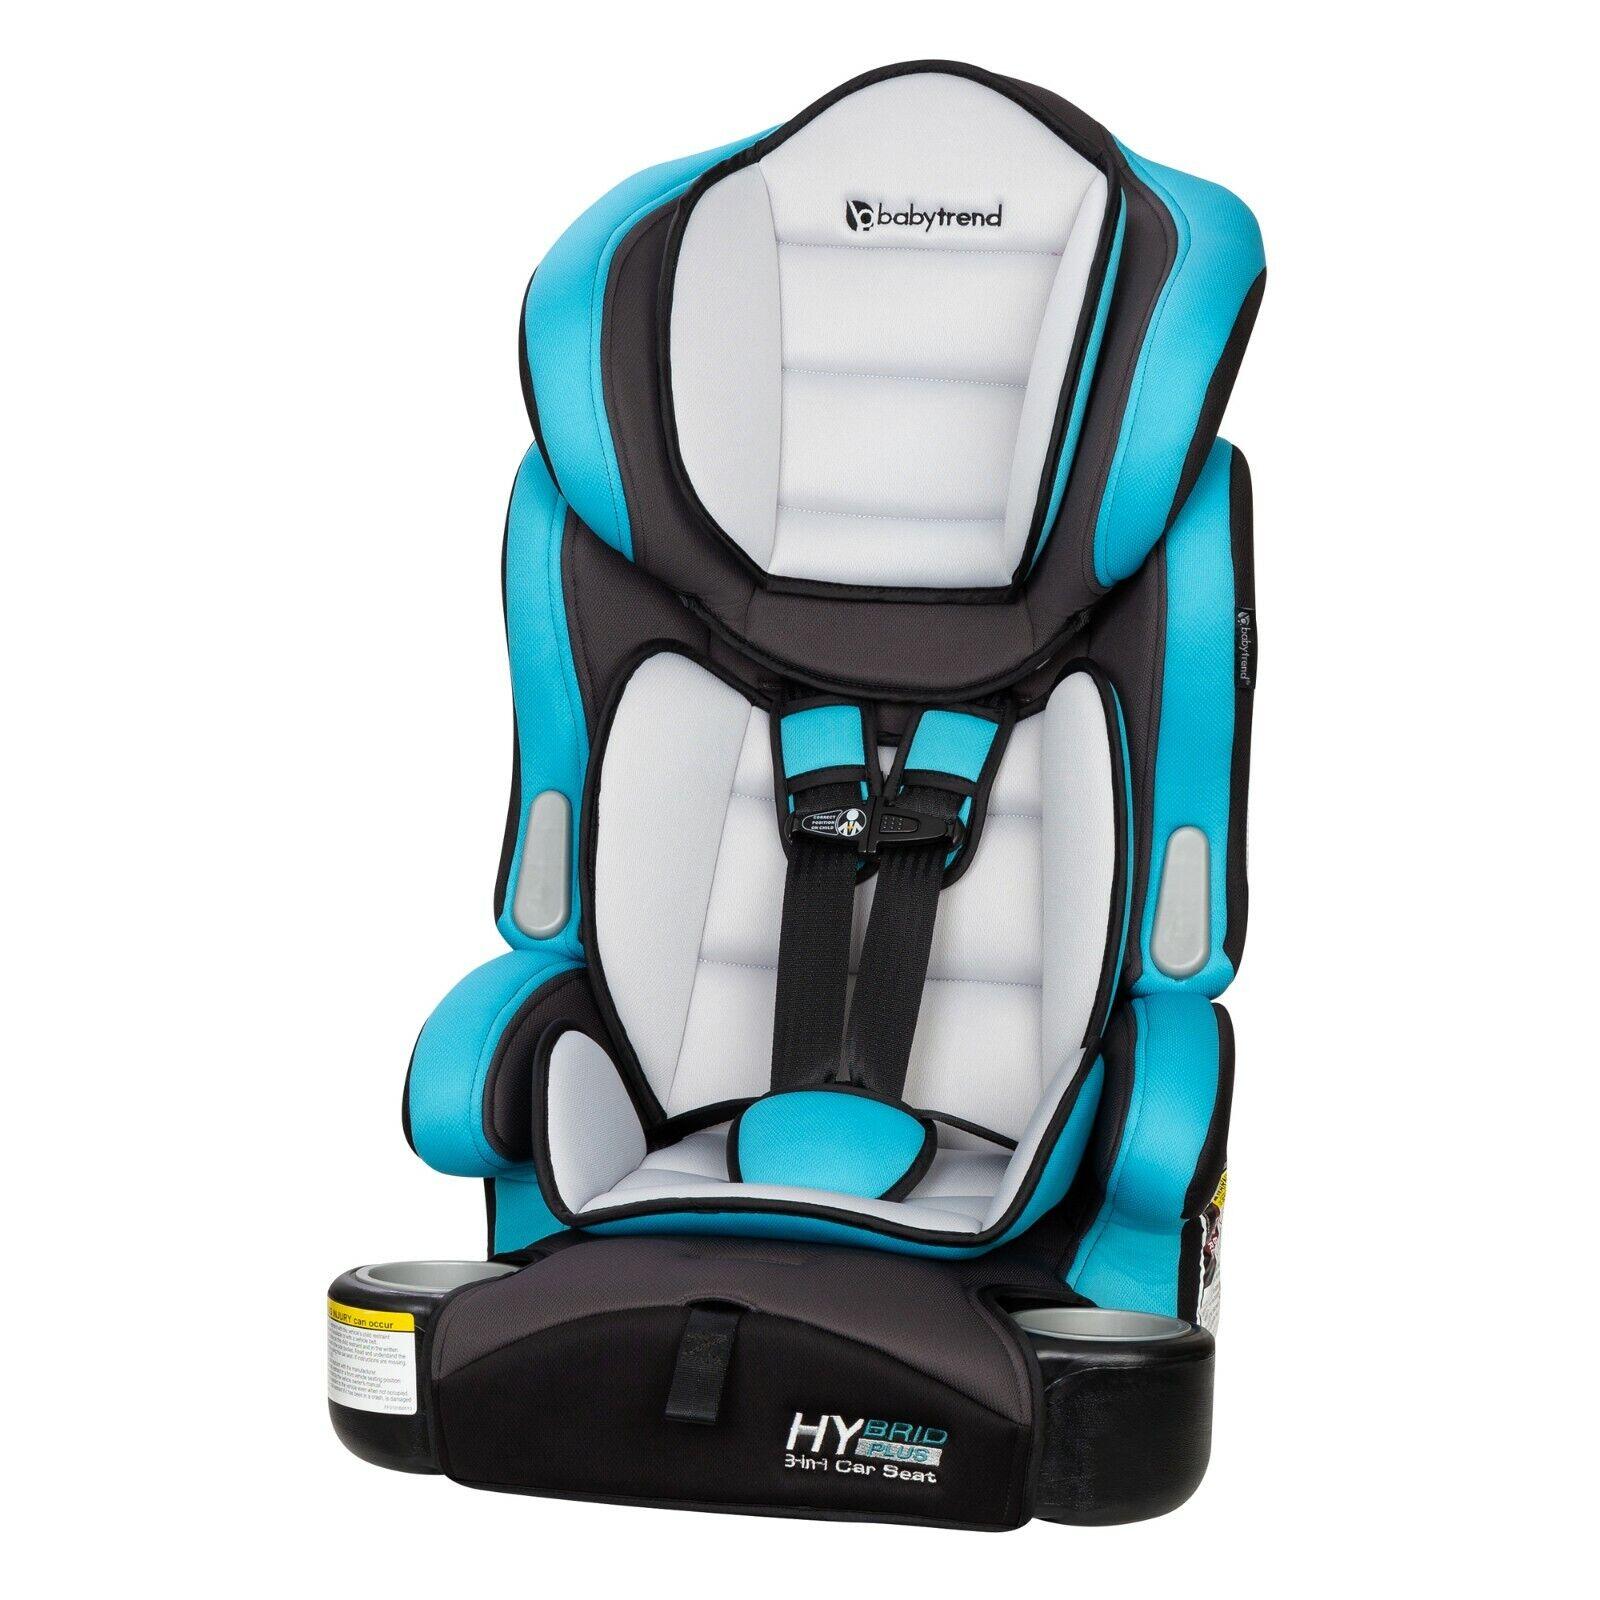 booster car seat bermuda hybrid plus 3